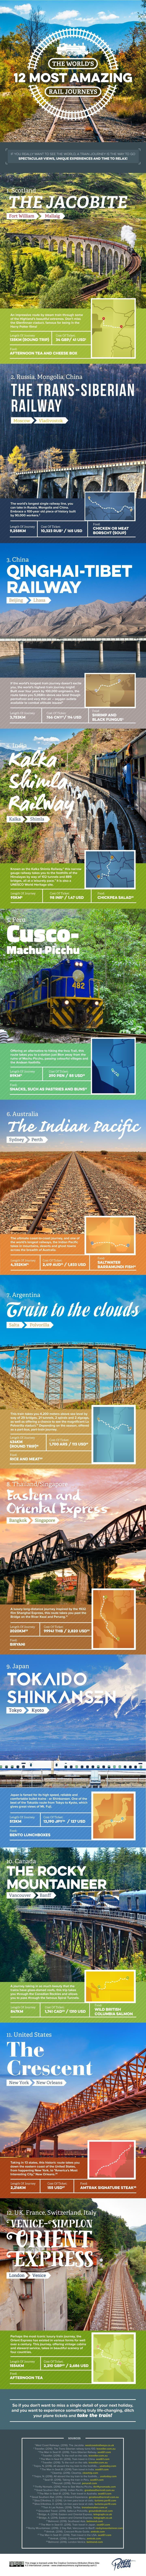 The world's greatest railway journeys